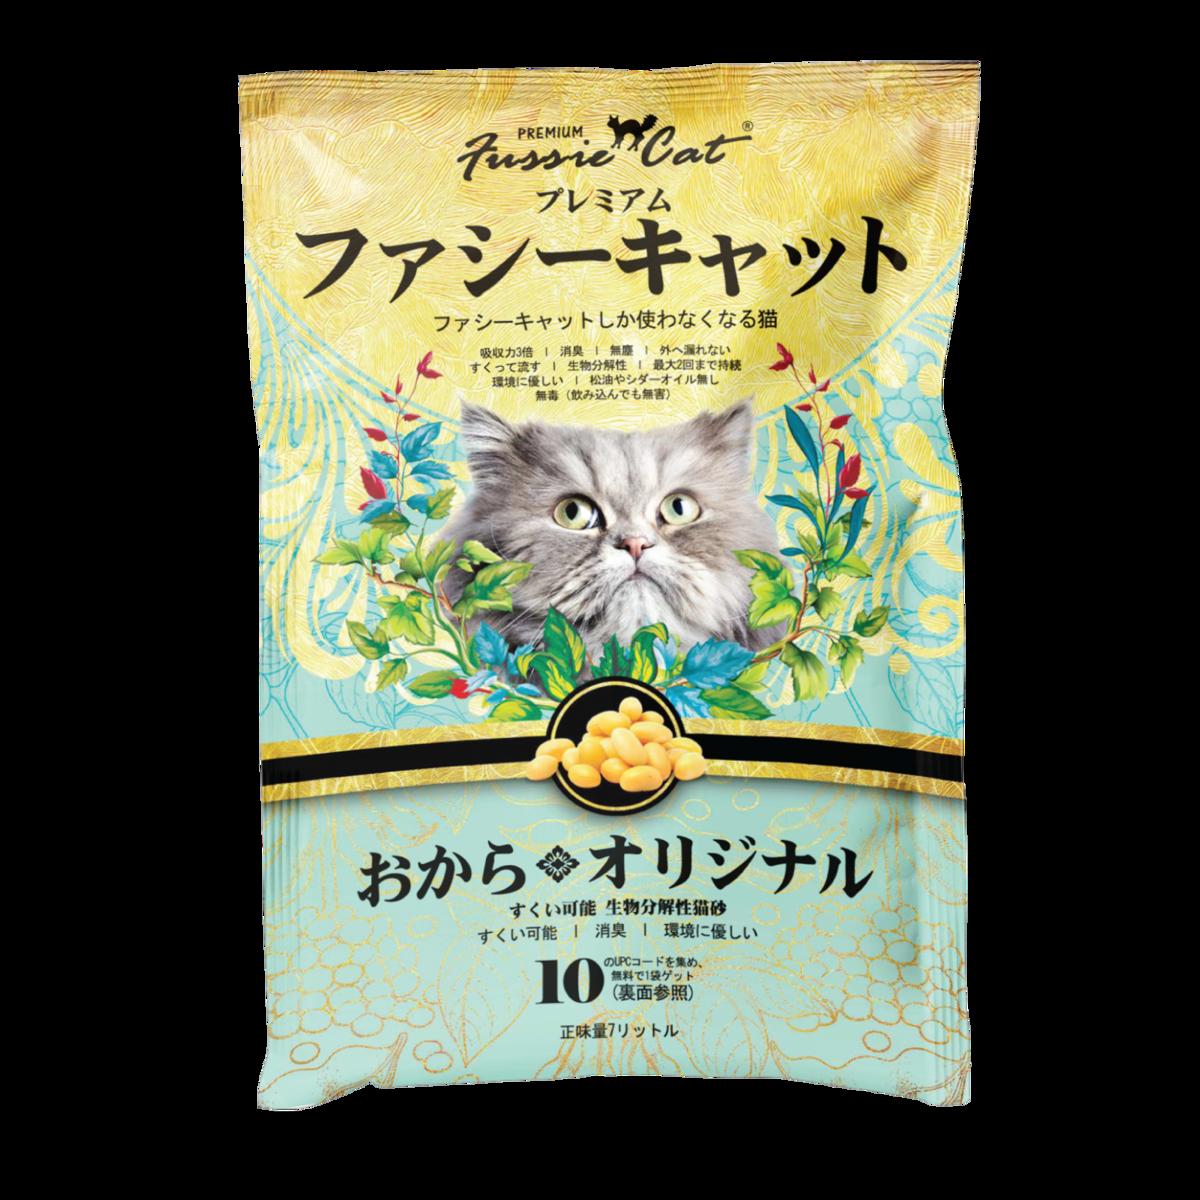 Fussie Cat Soybean Litter (Japanese) 7L裝X 6 Bags